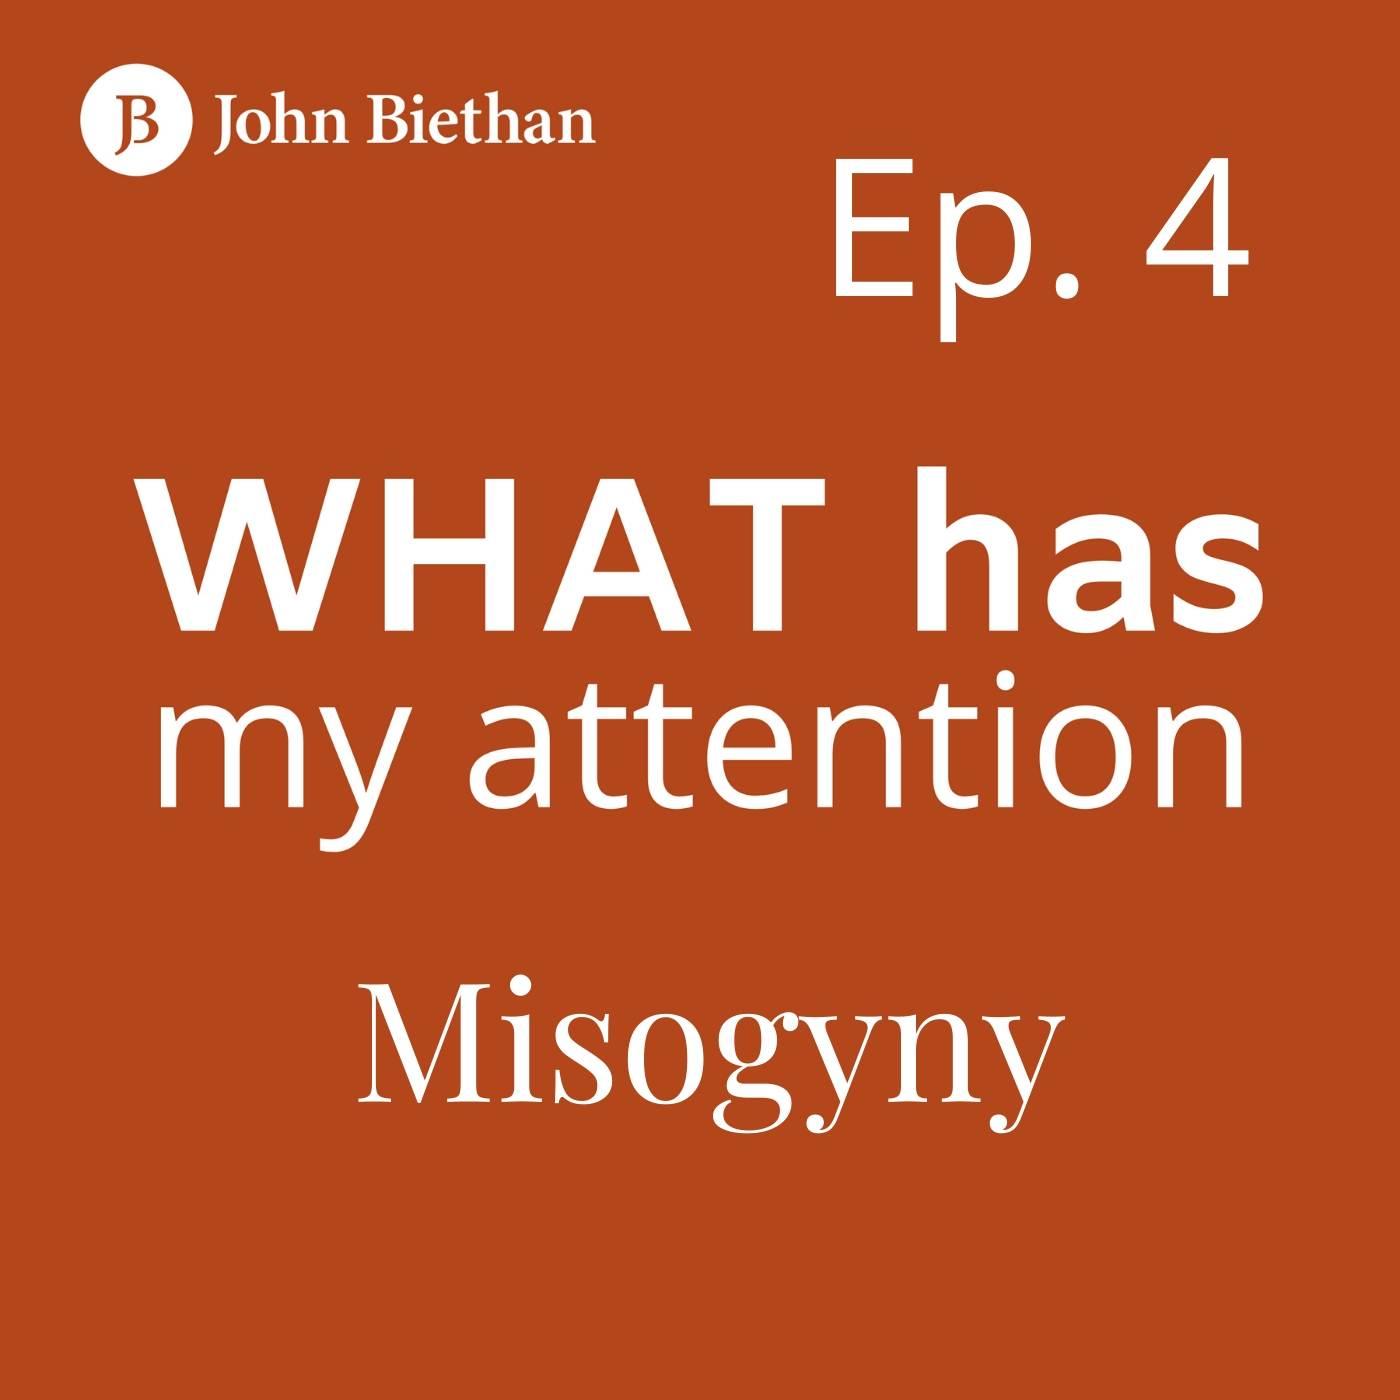 Ep. 4 Misogyny